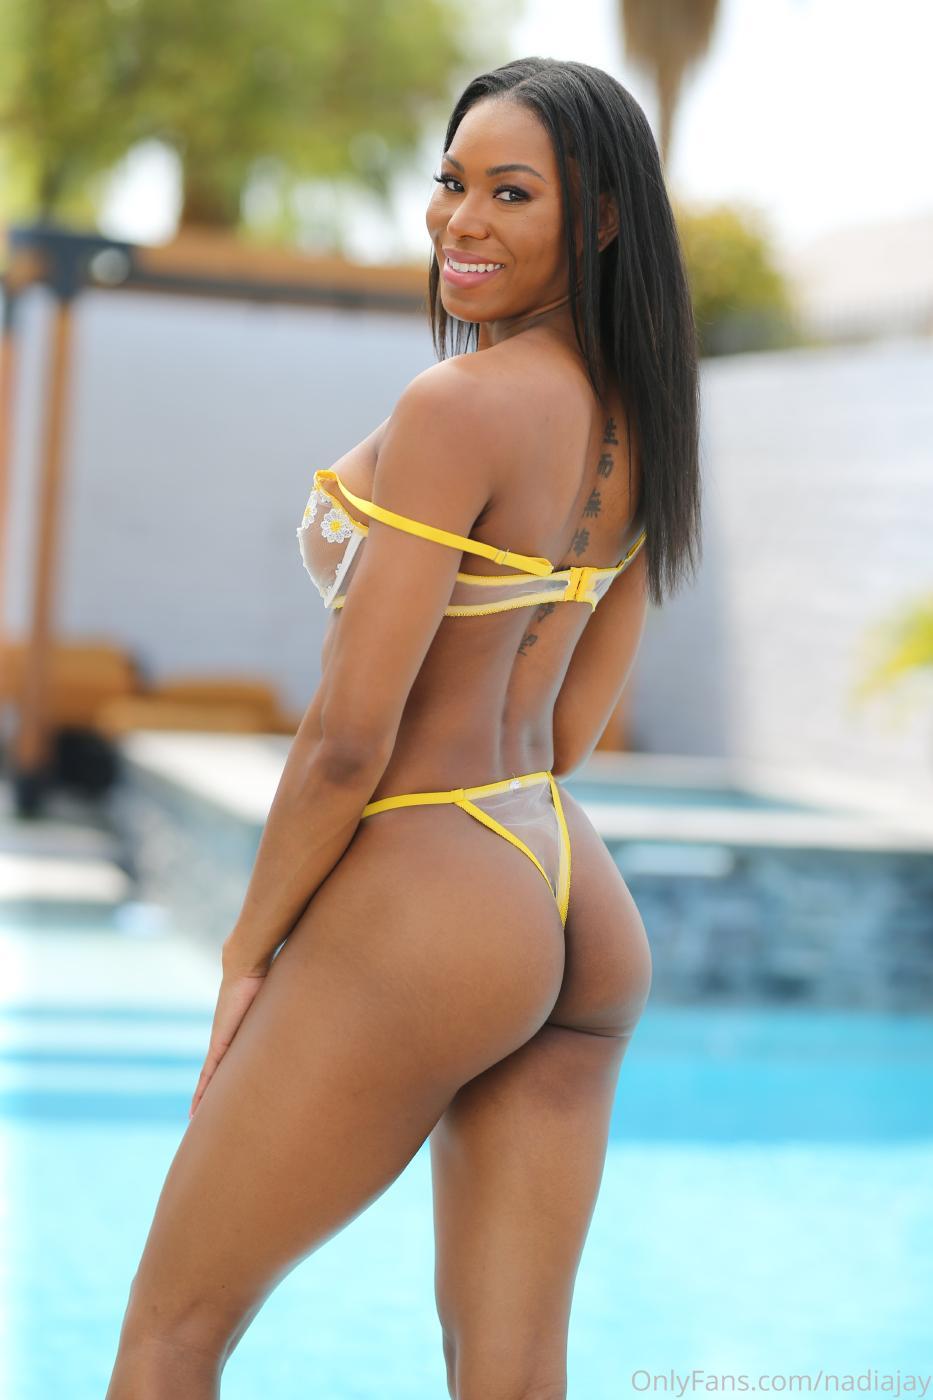 Nadia Jay Nude Lingerie Pool Strip Onlyfans Set Leaked0004